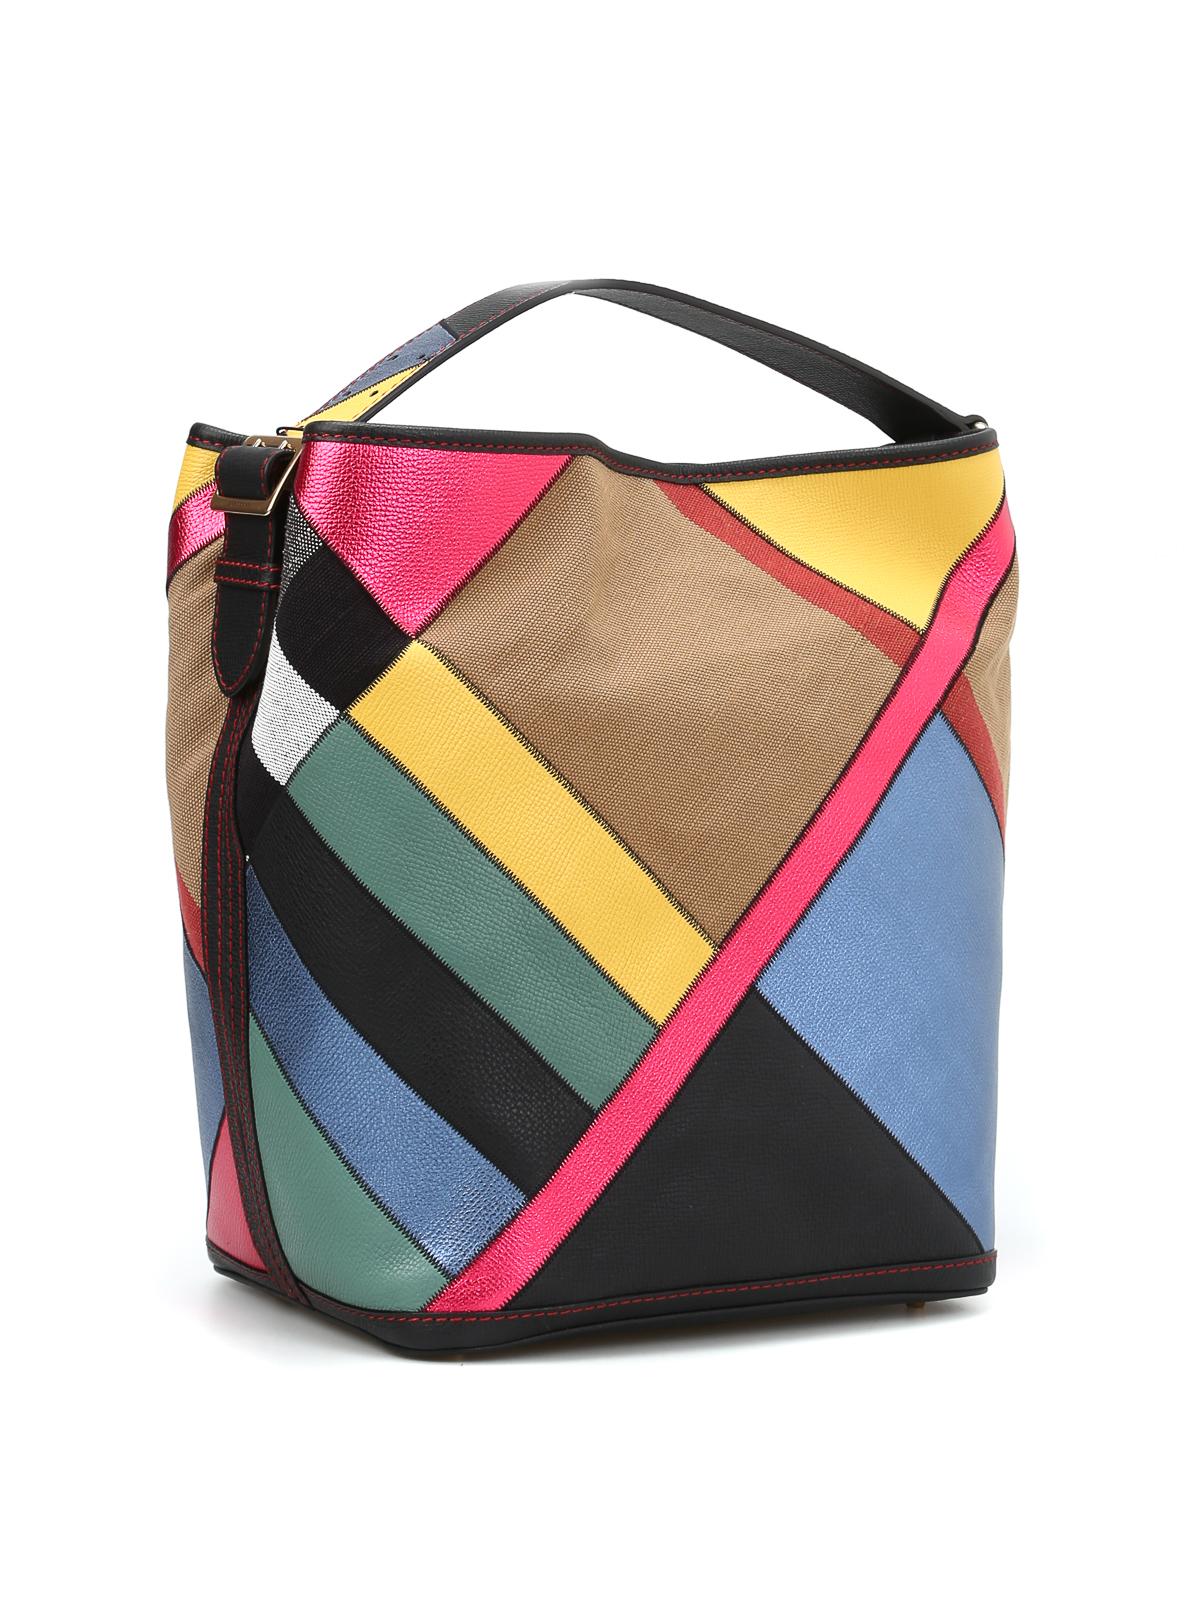 b32bdae6dd6 Burberry - Ashby multicolour hobo bag - shoulder bags - 40418641